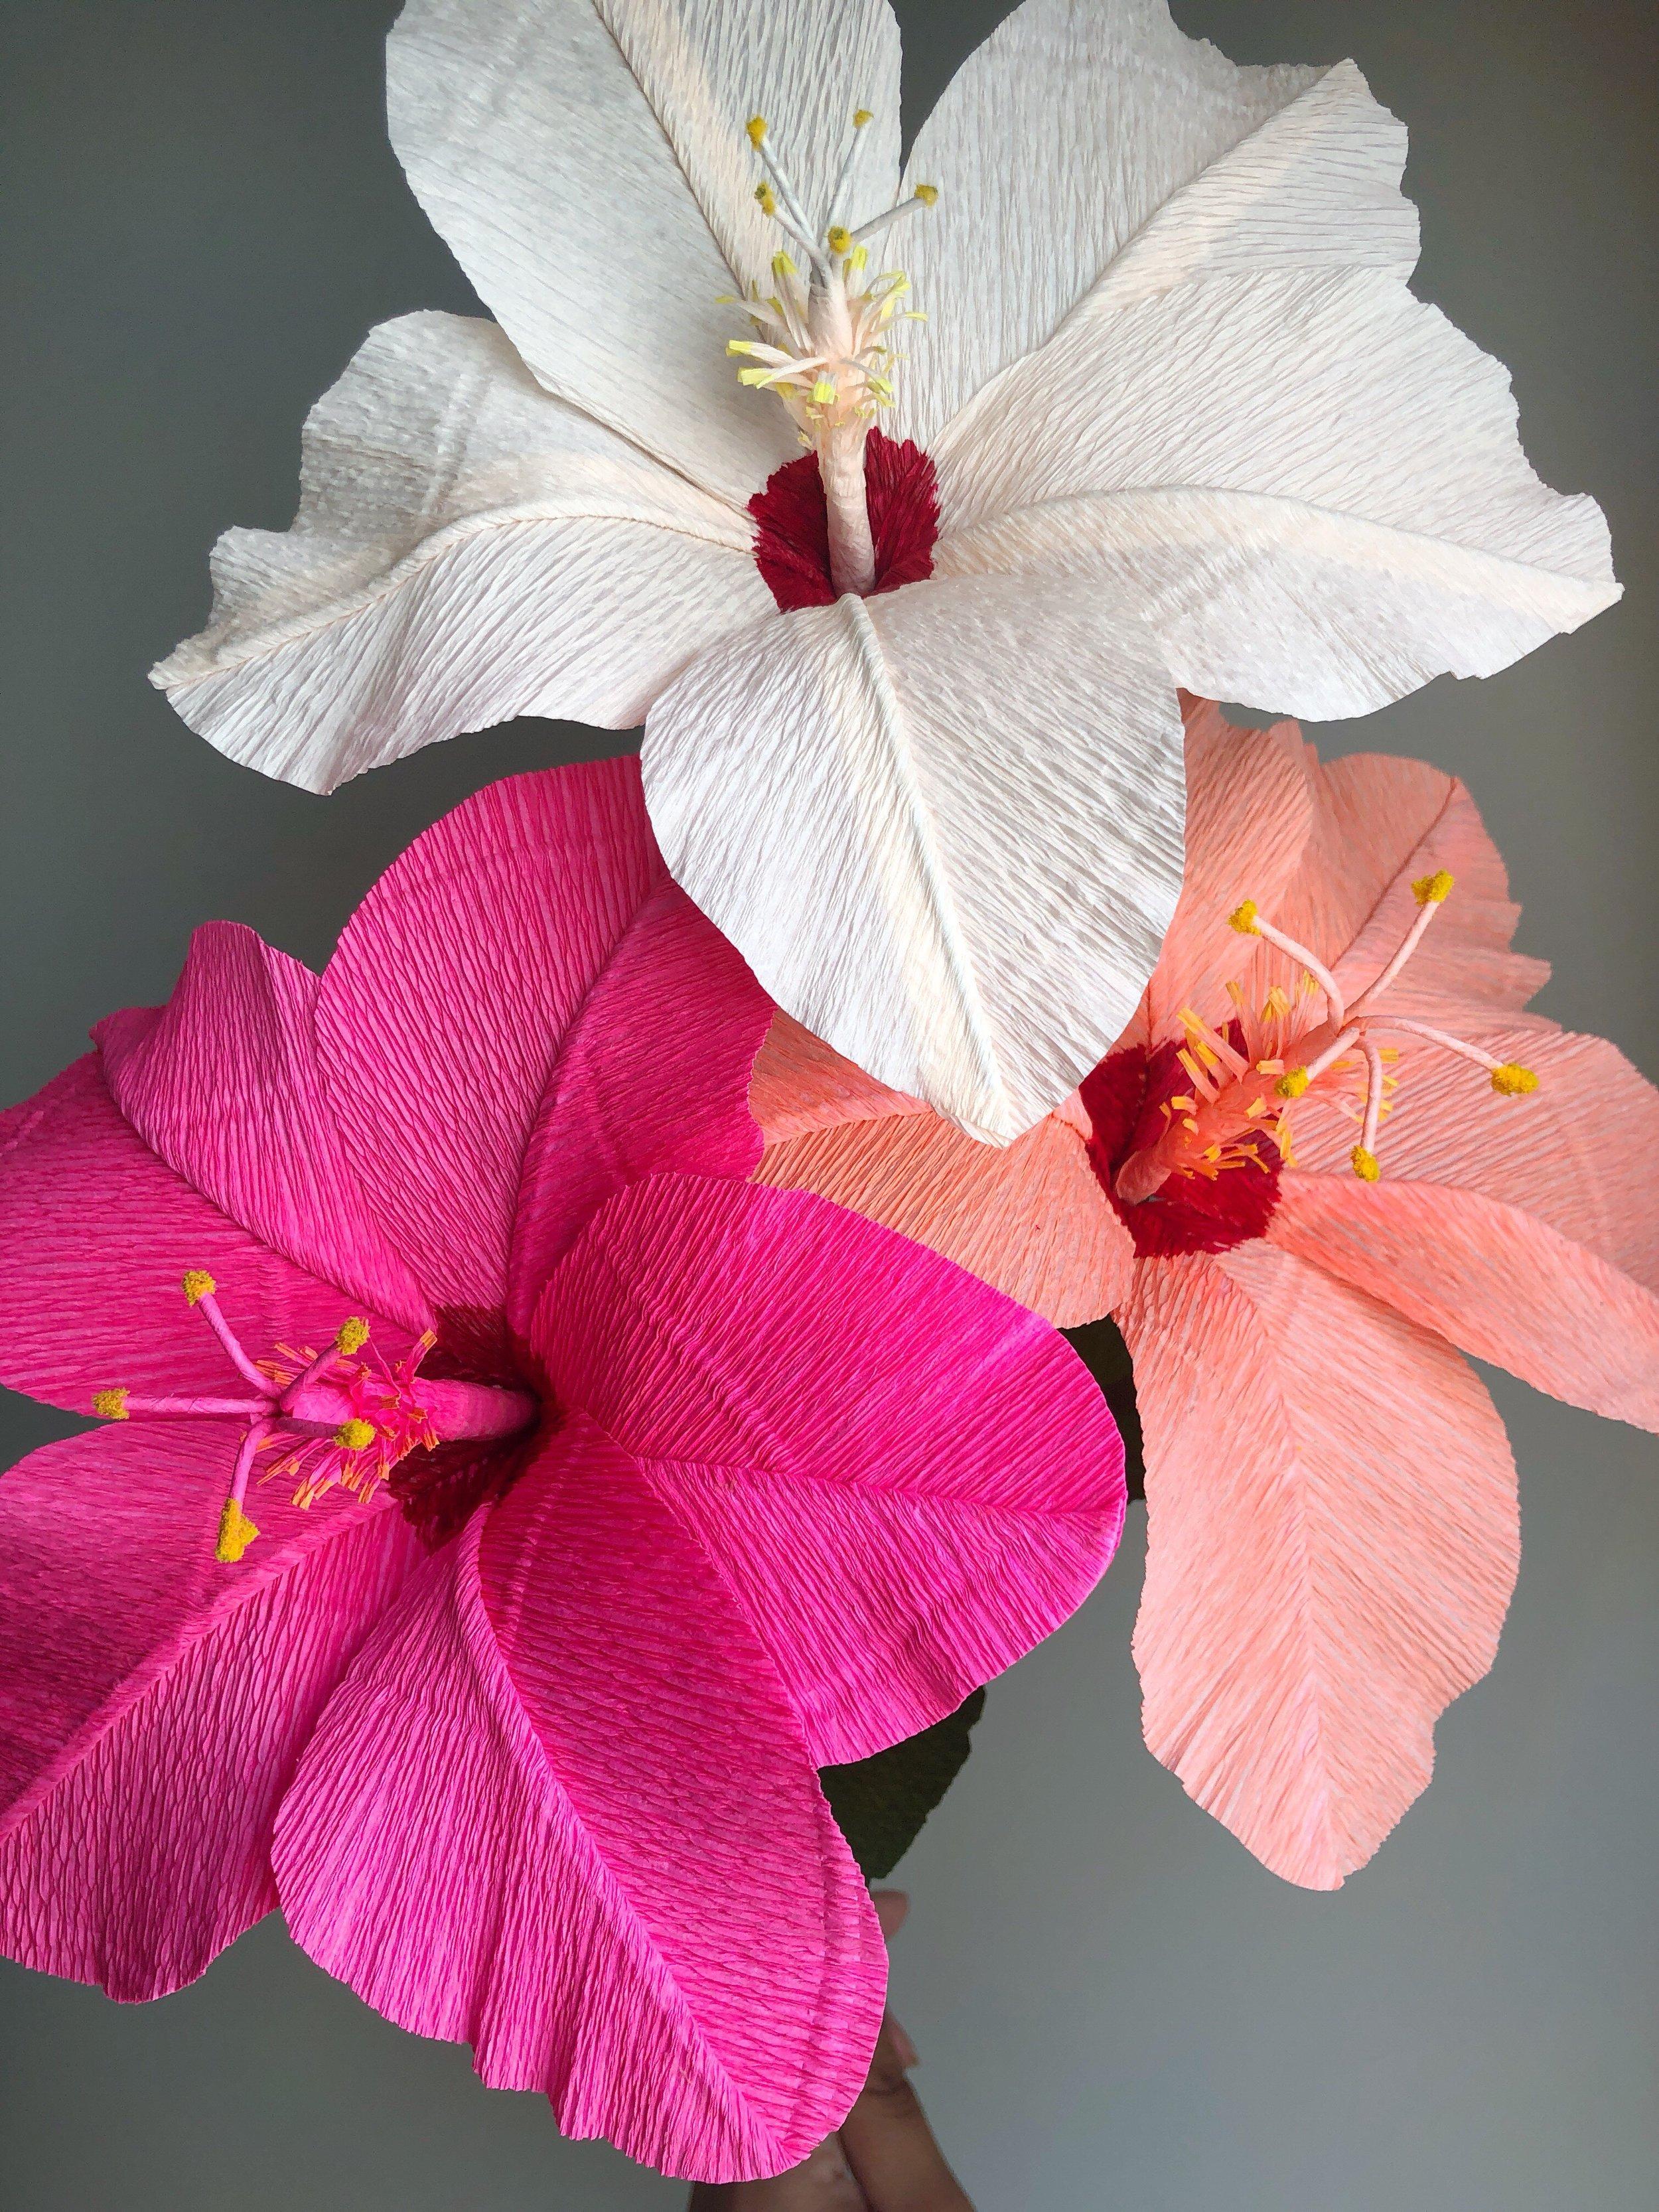 revery-flora-steadfastsupply-hibiscus02.jpeg